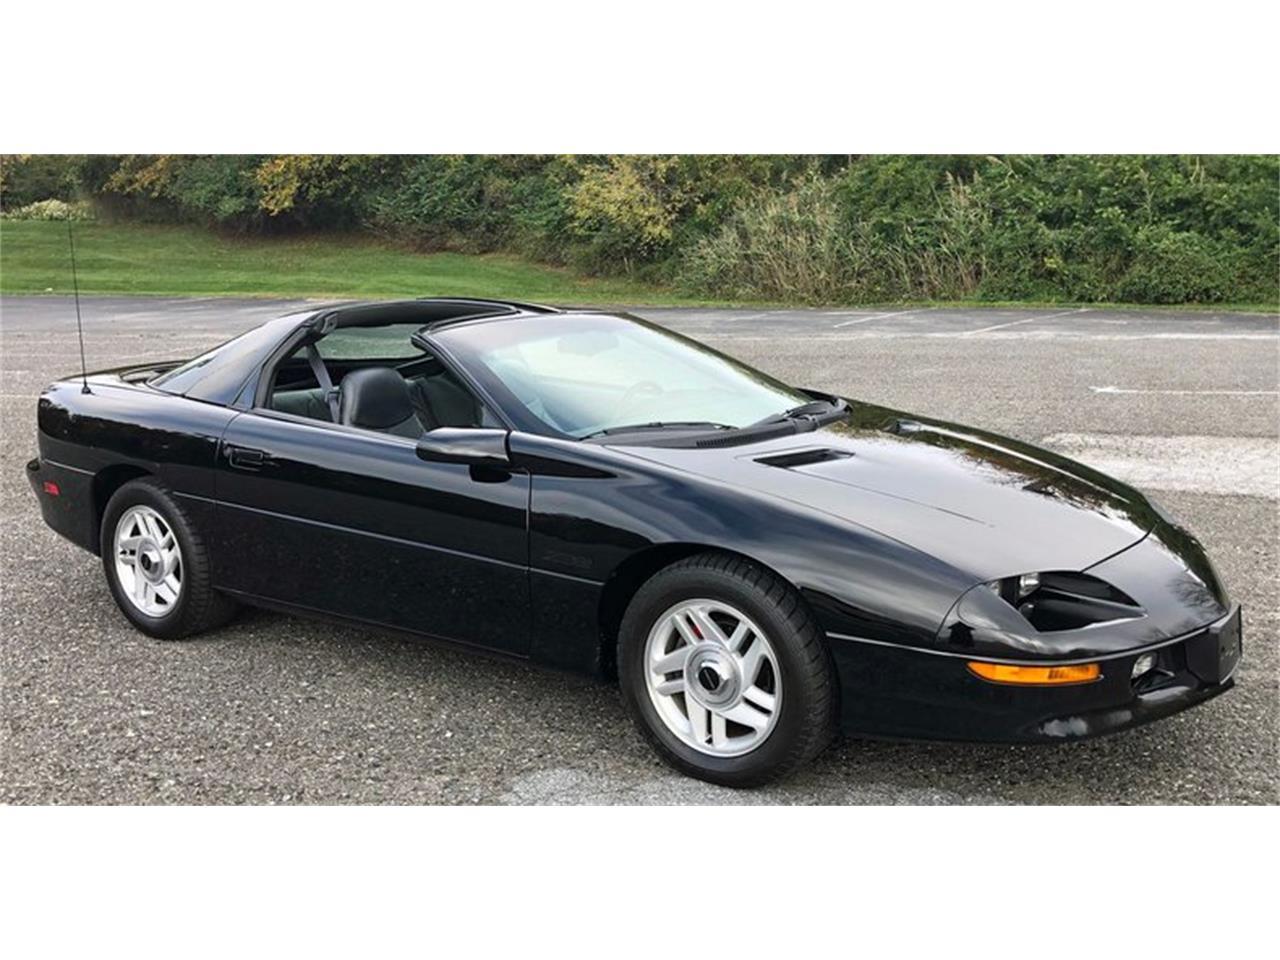 1995 Chevrolet Camaro (CC-1423470) for sale in West Chester, Pennsylvania